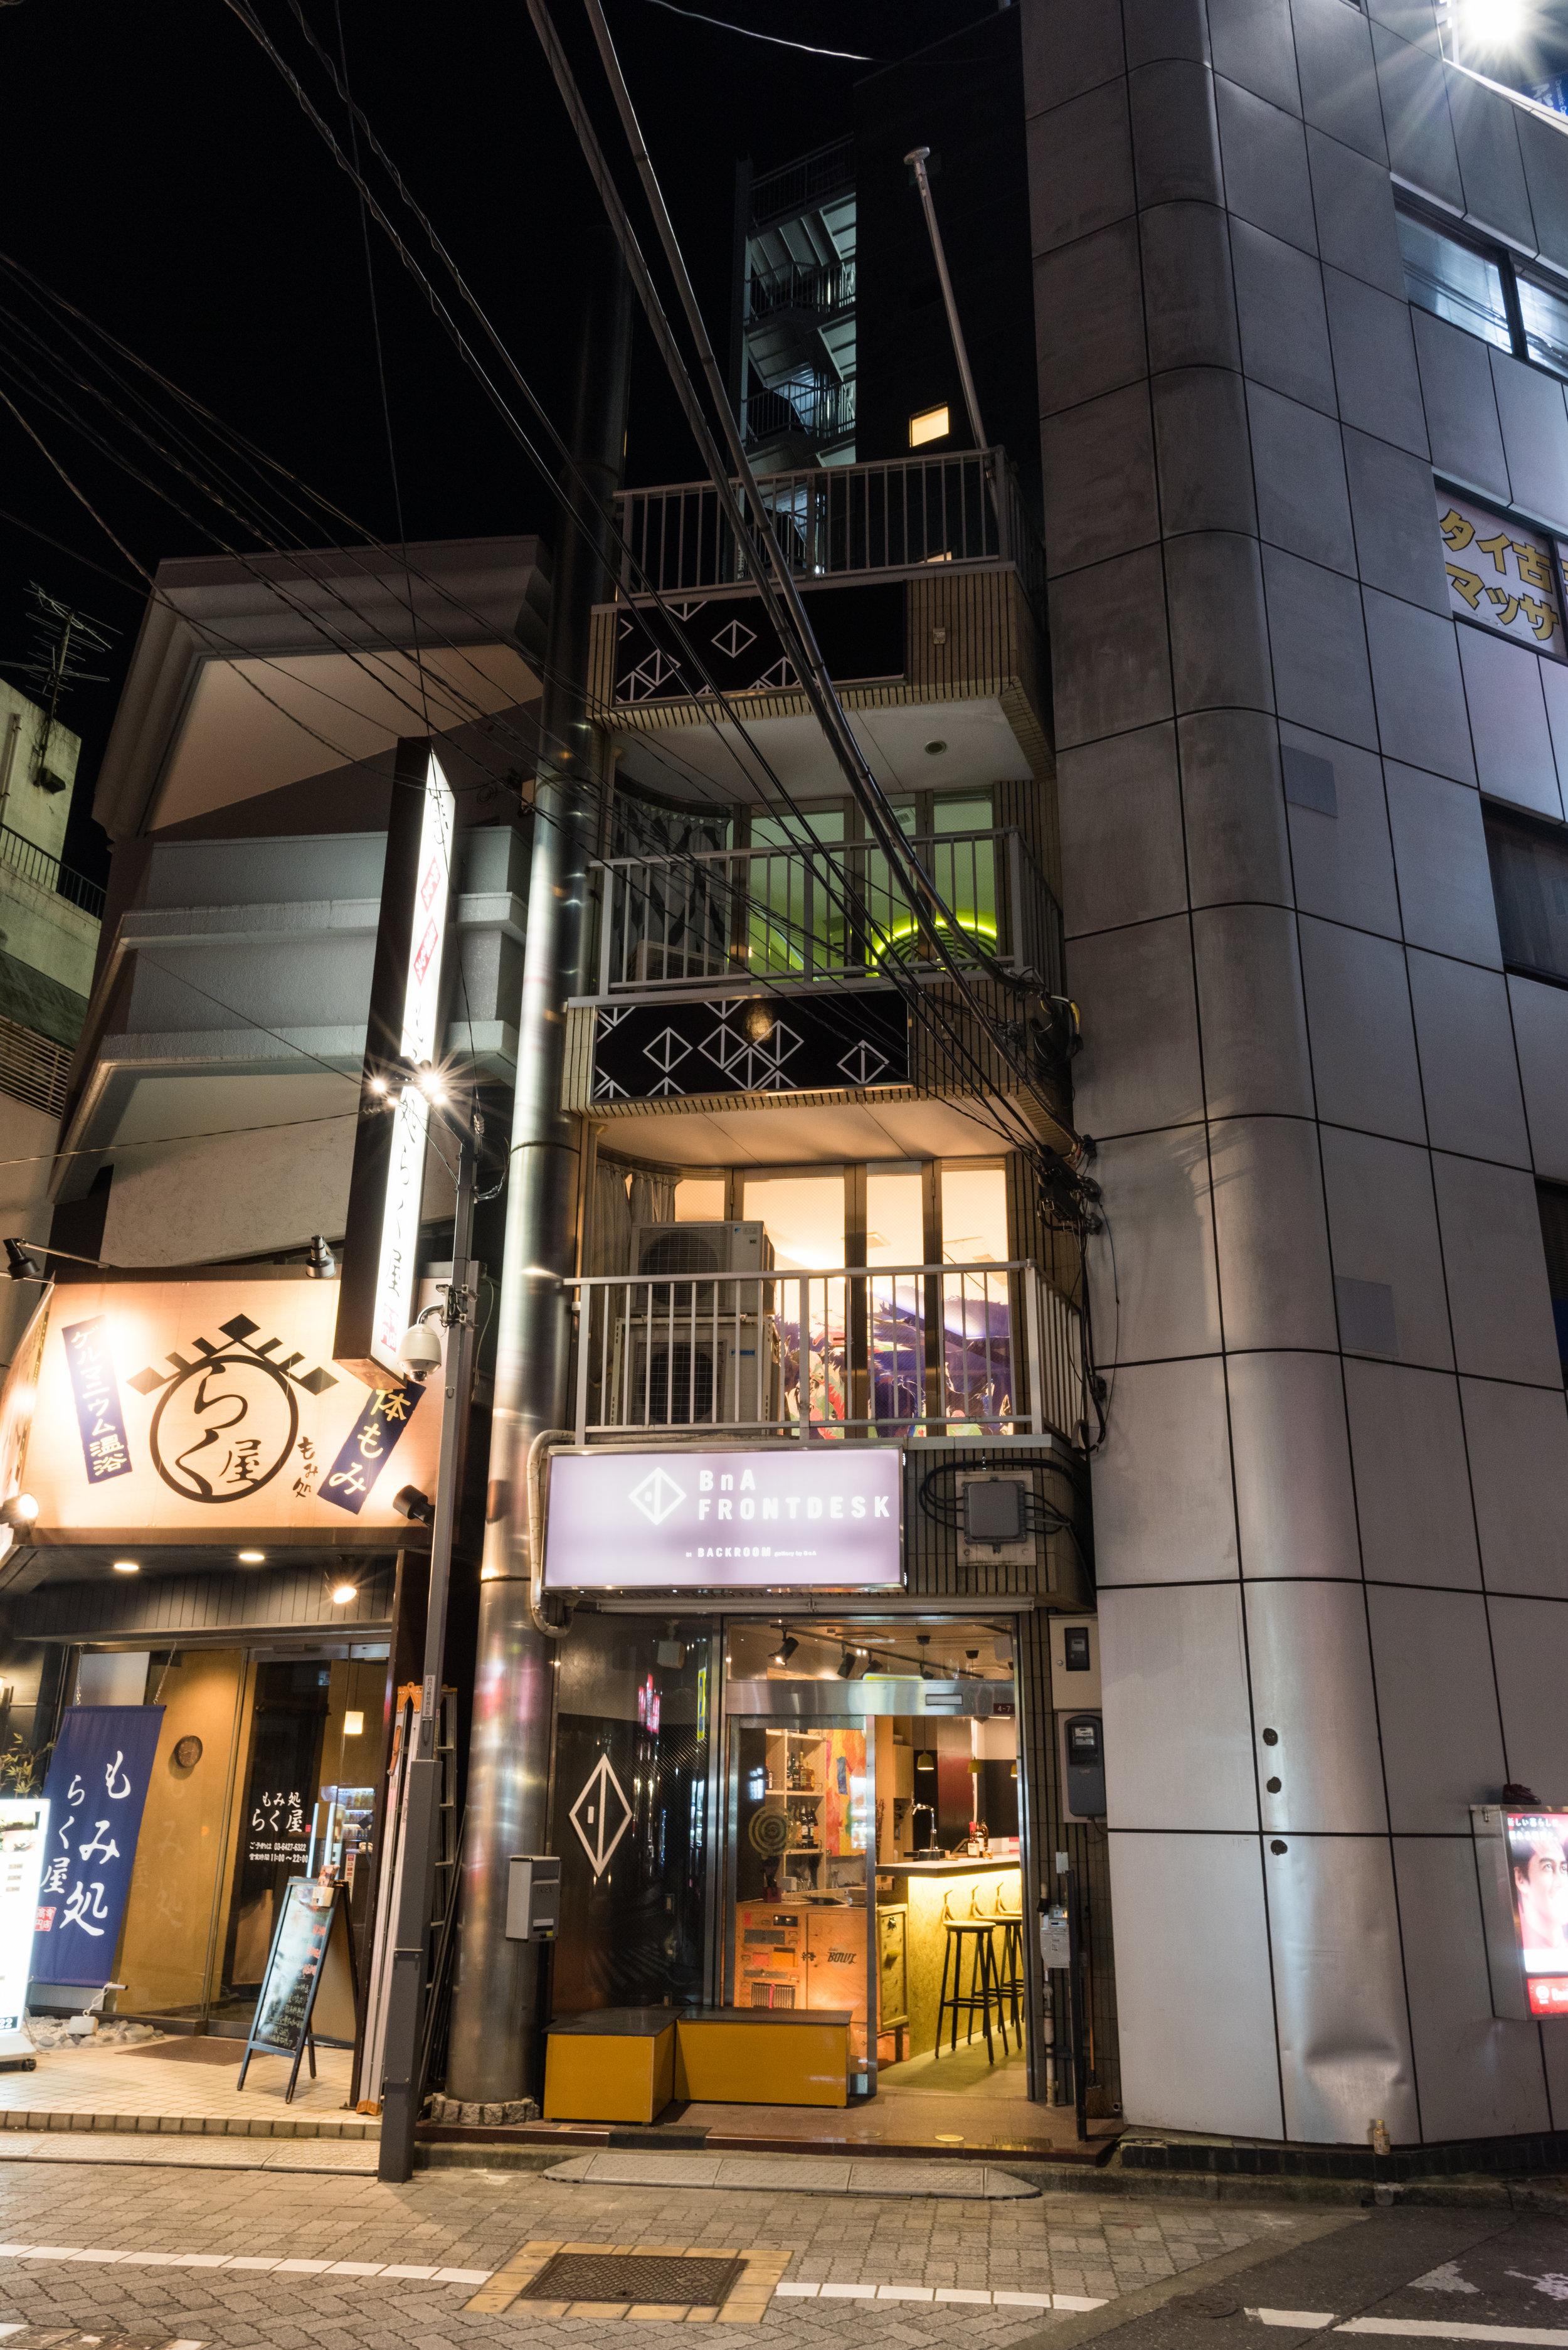 City Scale Hotel Concept - BnA Koenji   Role: Concept Development & Execution